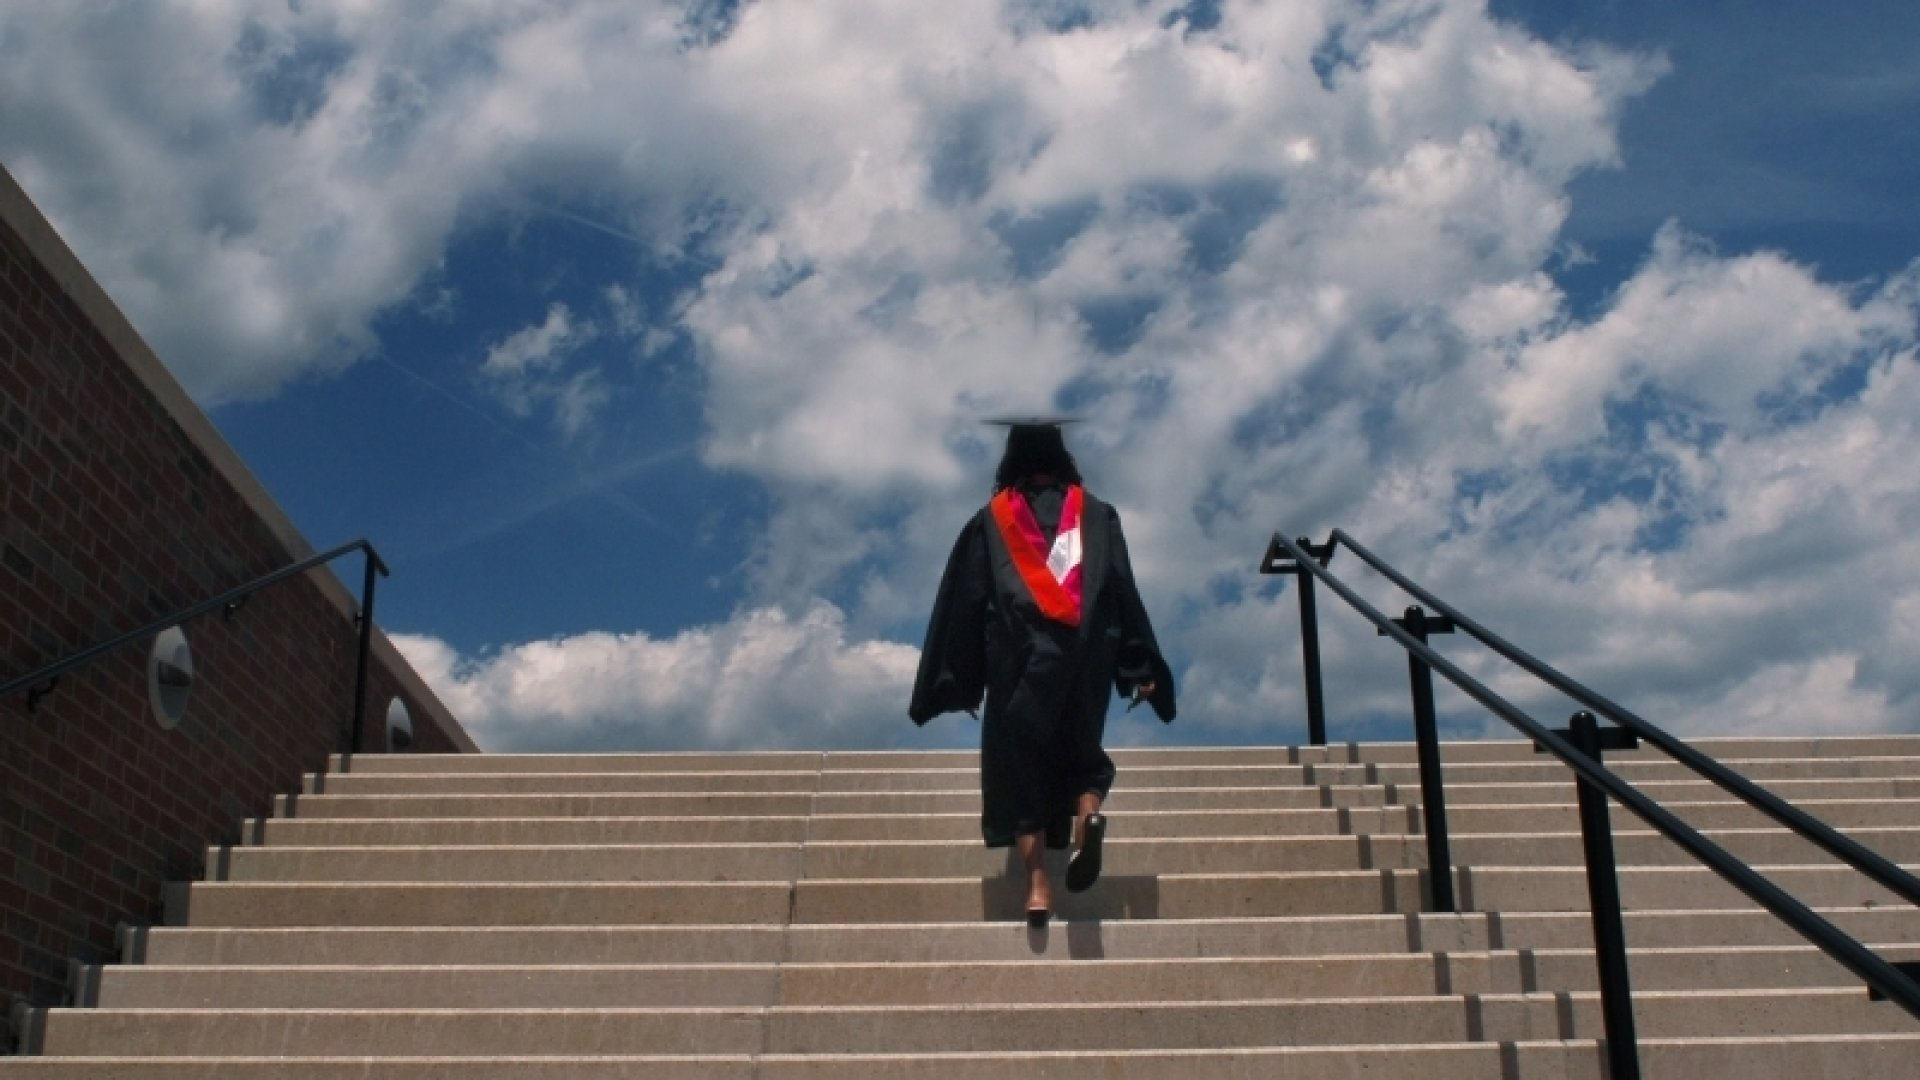 The Best Colleges for Entrepreneurs